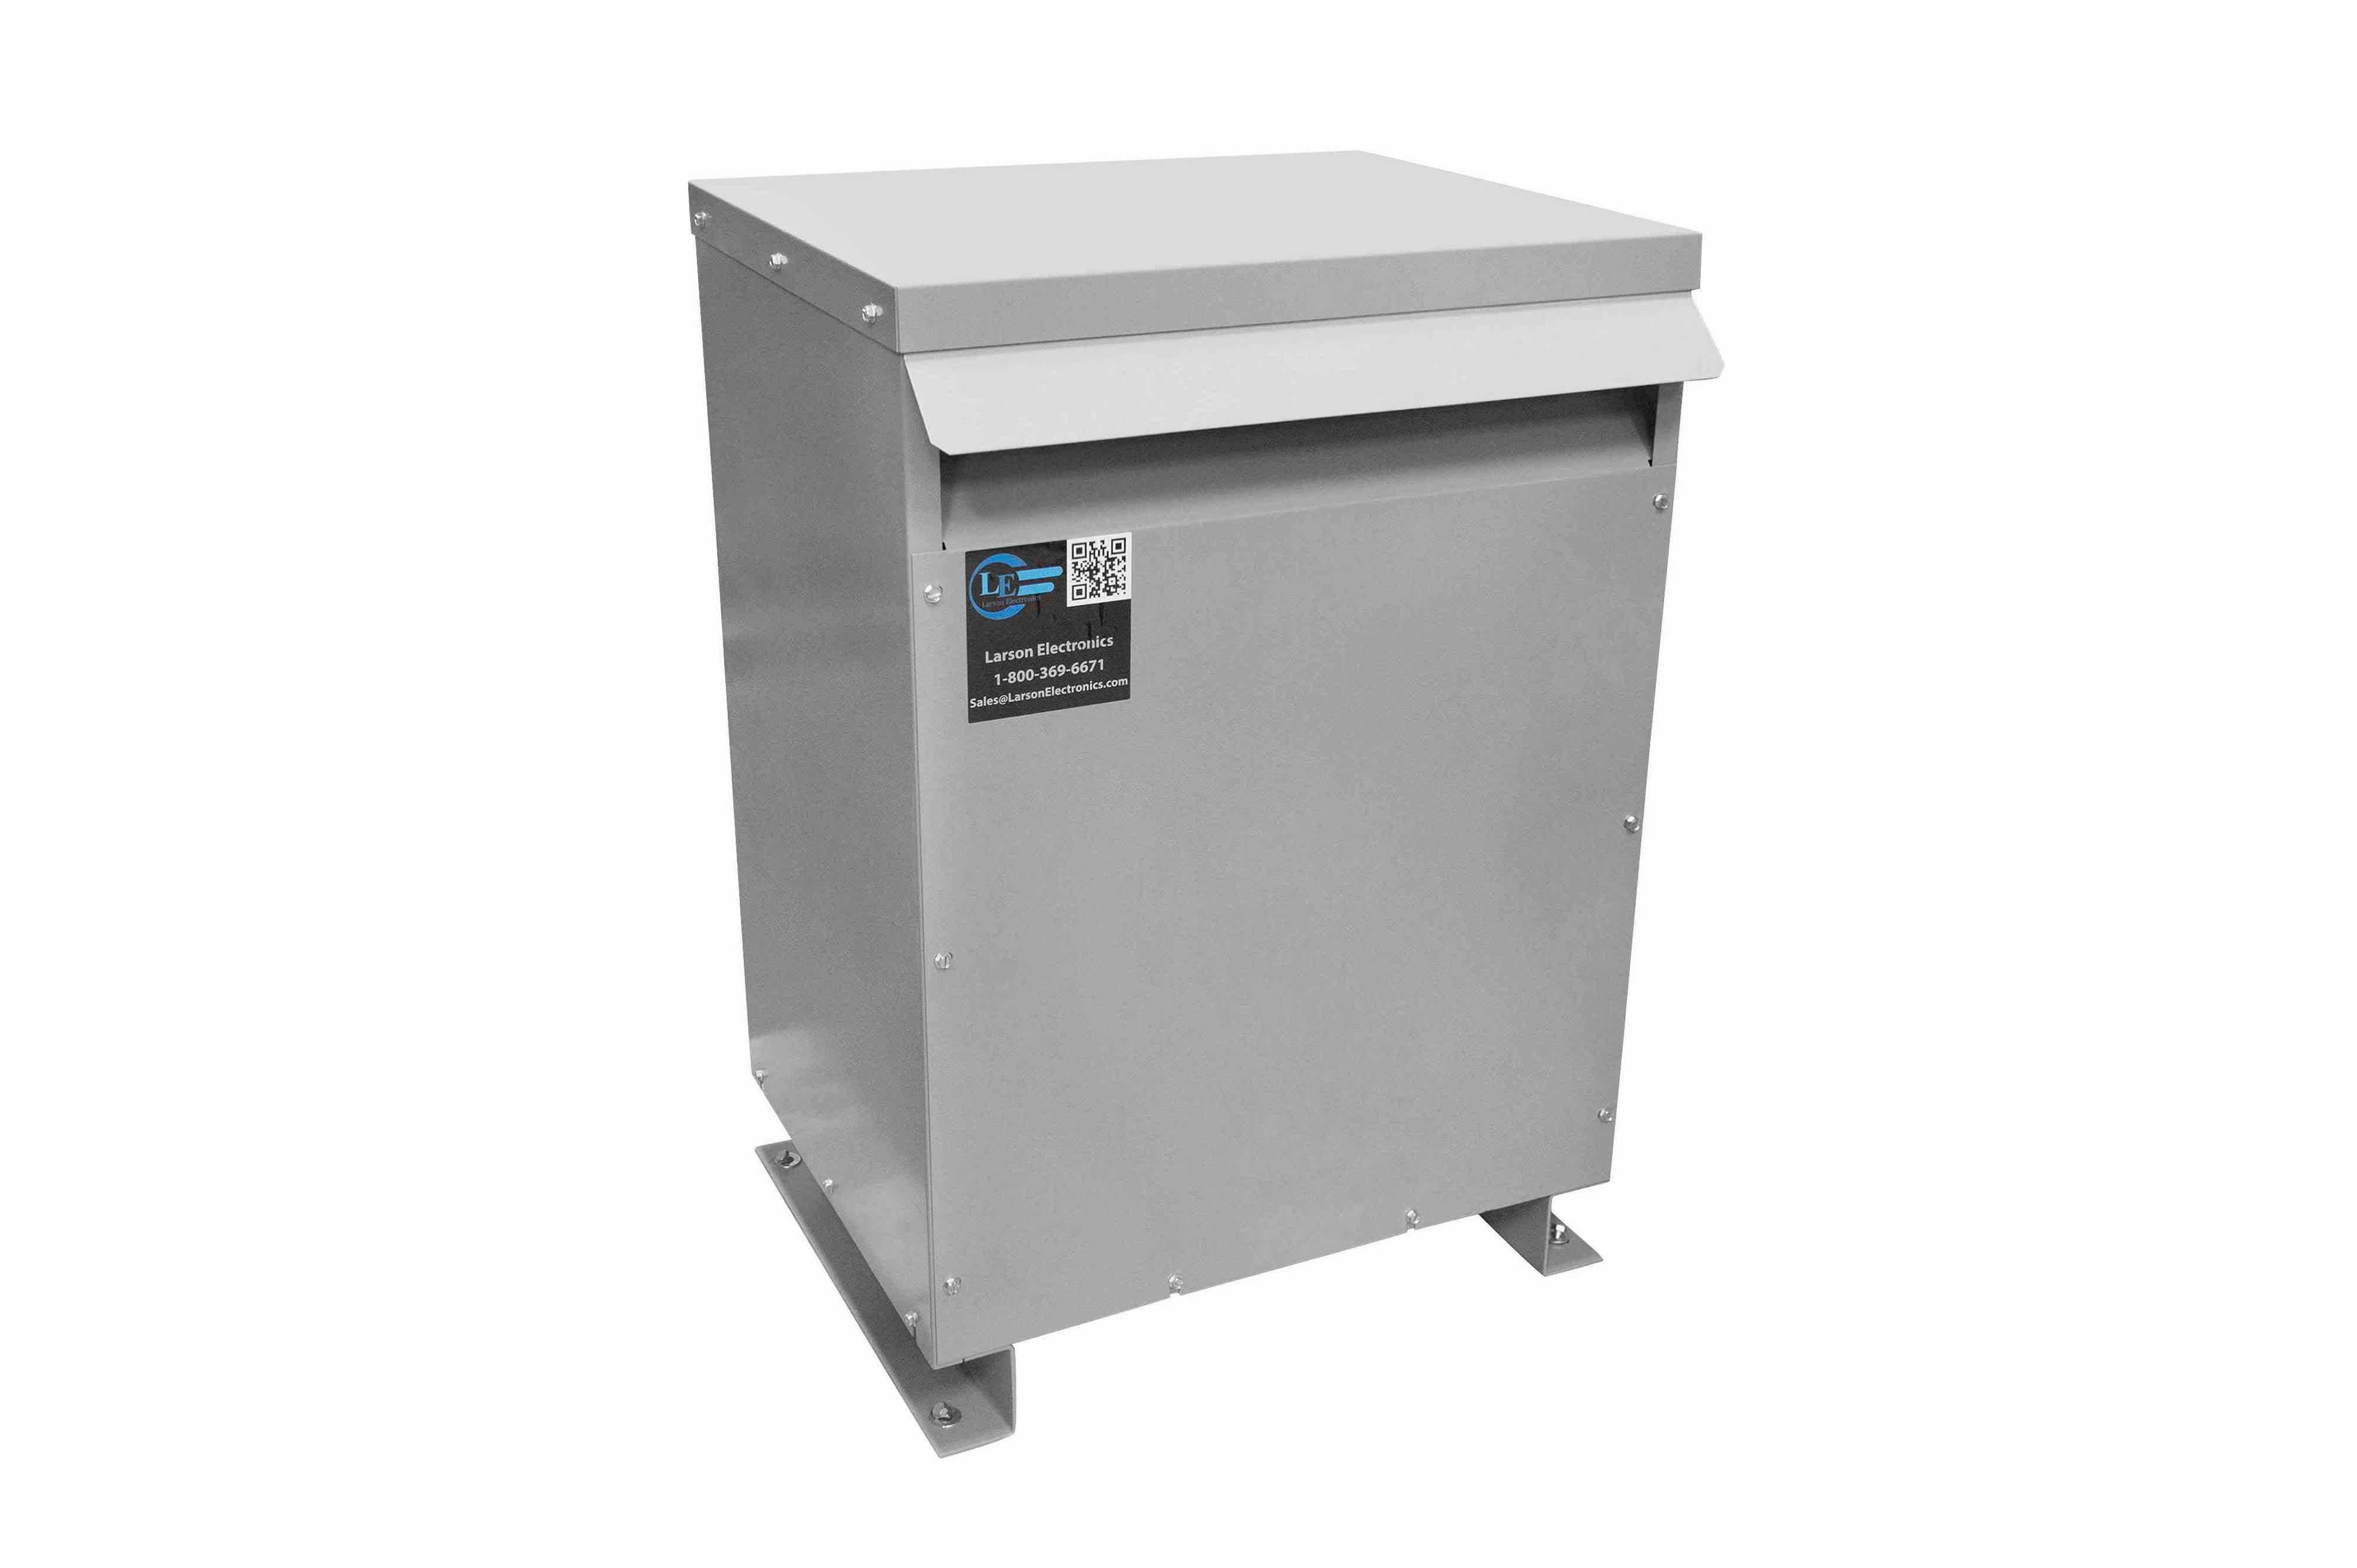 37.5 kVA 3PH Isolation Transformer, 400V Wye Primary, 240V Delta Secondary, N3R, Ventilated, 60 Hz